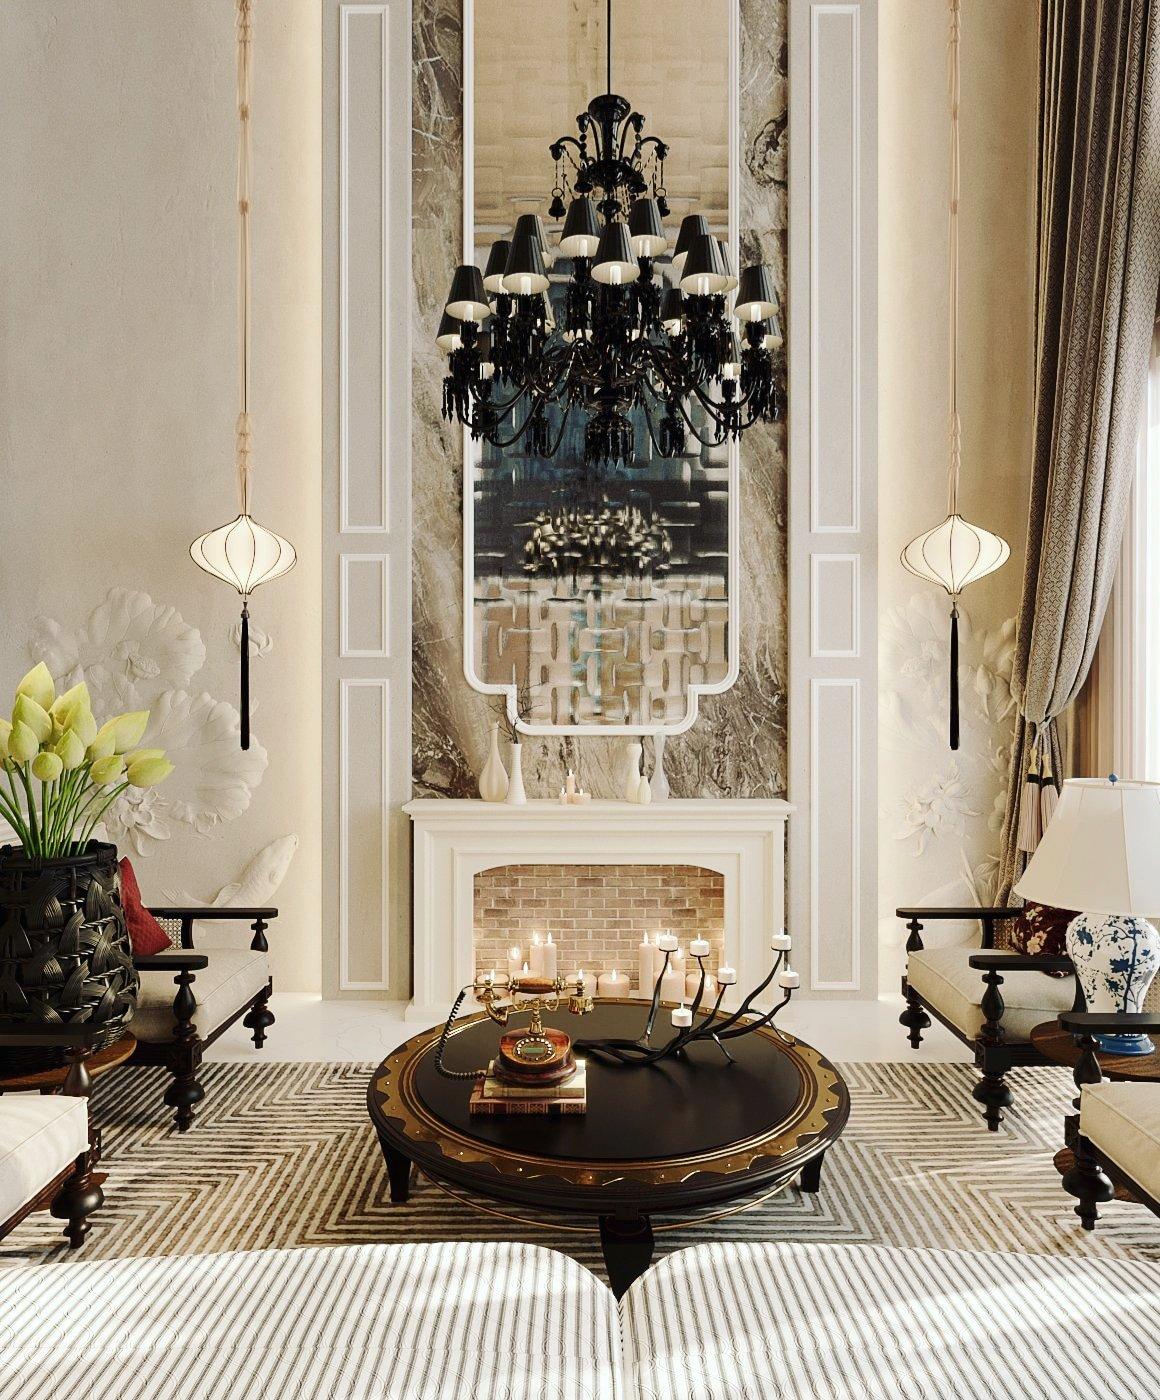 top_10_resort_thiet_ke_phong_cach_indochine_style_sang_trong_an_tuong